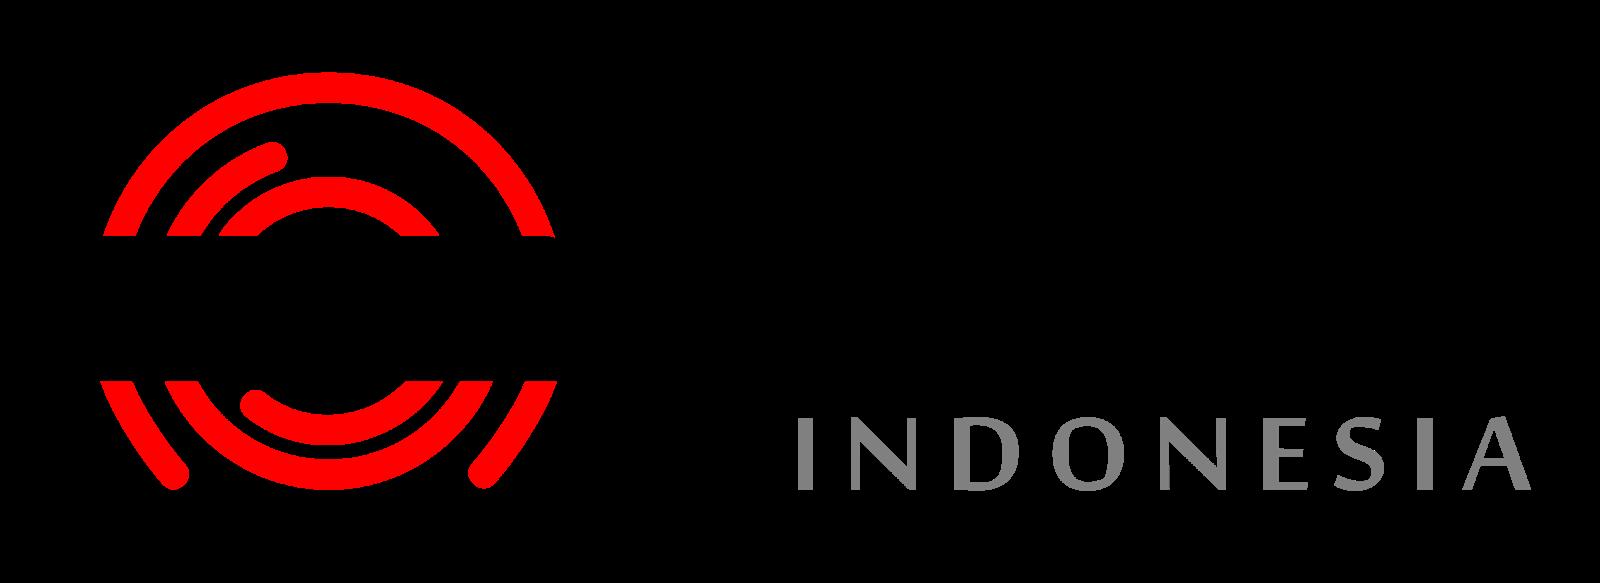 Lowongan Staff Marketing Online Customer Support Di Cv Technopartner Indonesia Yogyakarta Gaji Tetap Insentif Portal Info Lowongan Kerja Di Yogyakarta Terbaru 2020